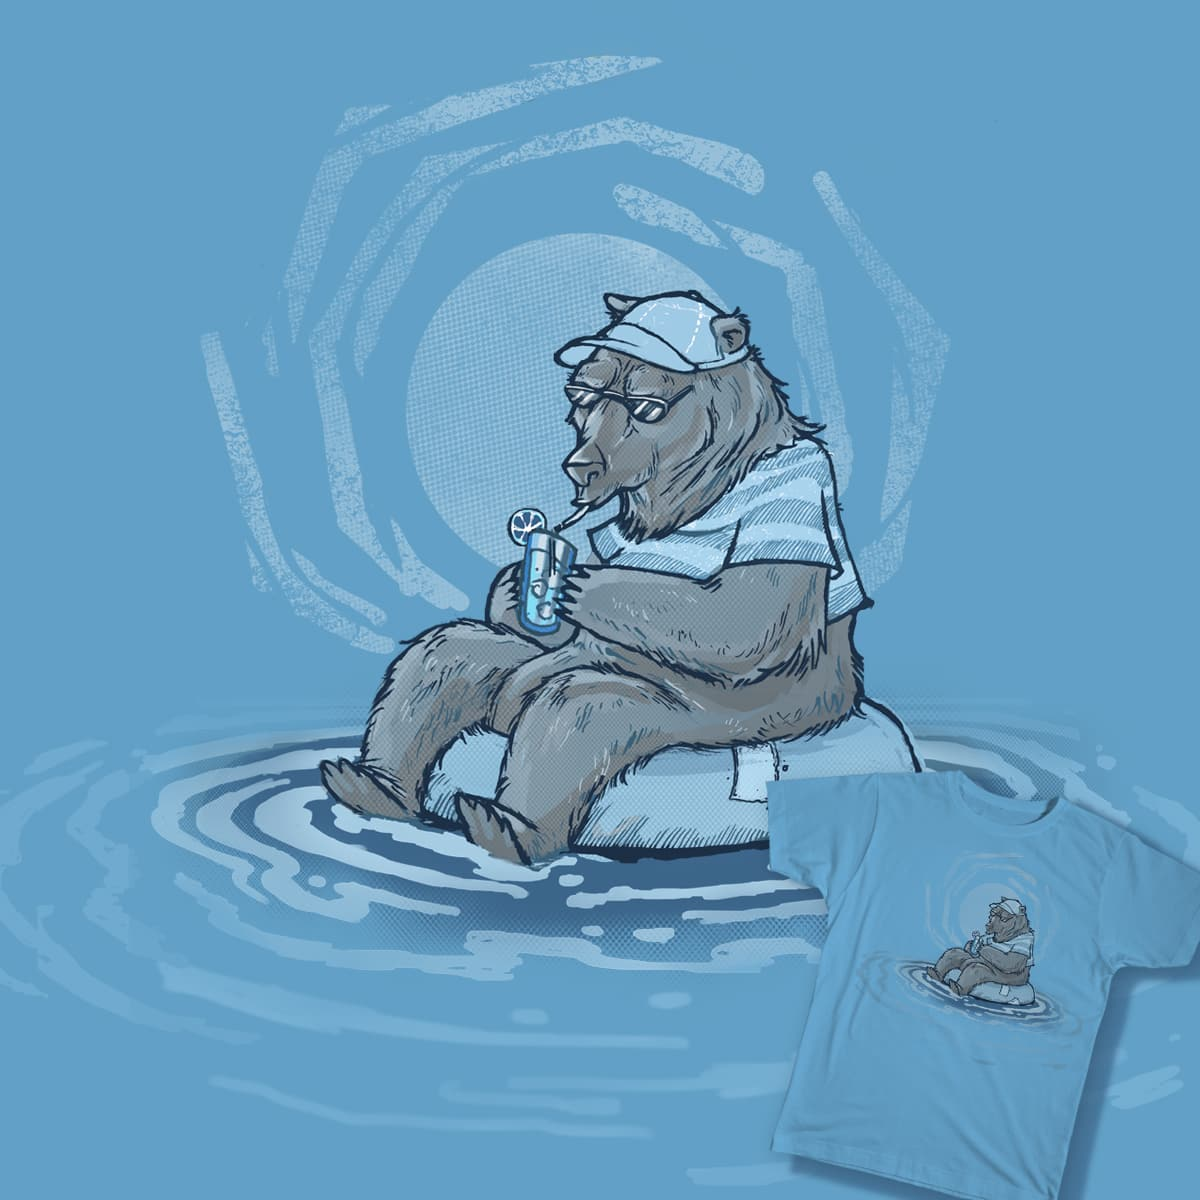 Summer bear by Seyer21 on Threadless